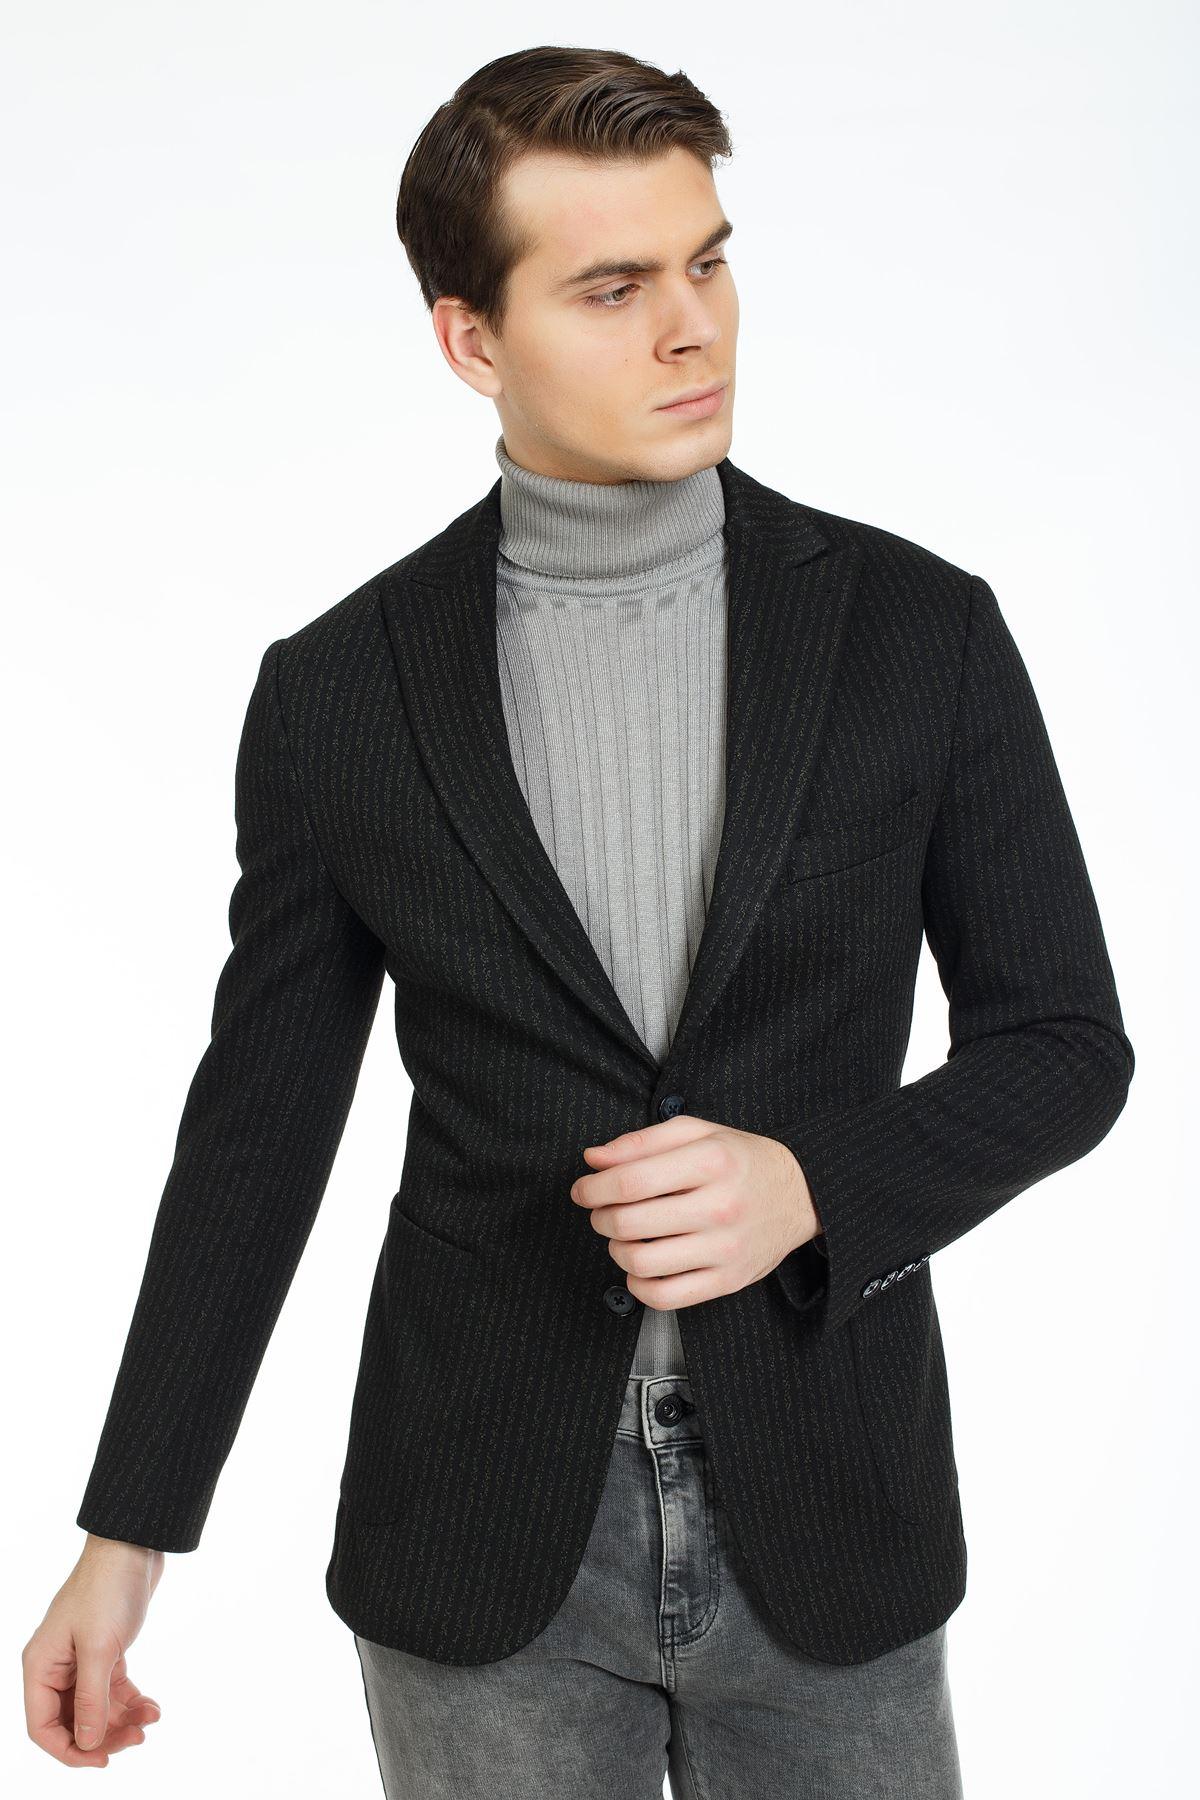 Siyah Yeşil Çizgili Süper Slim Kalıp Ceket